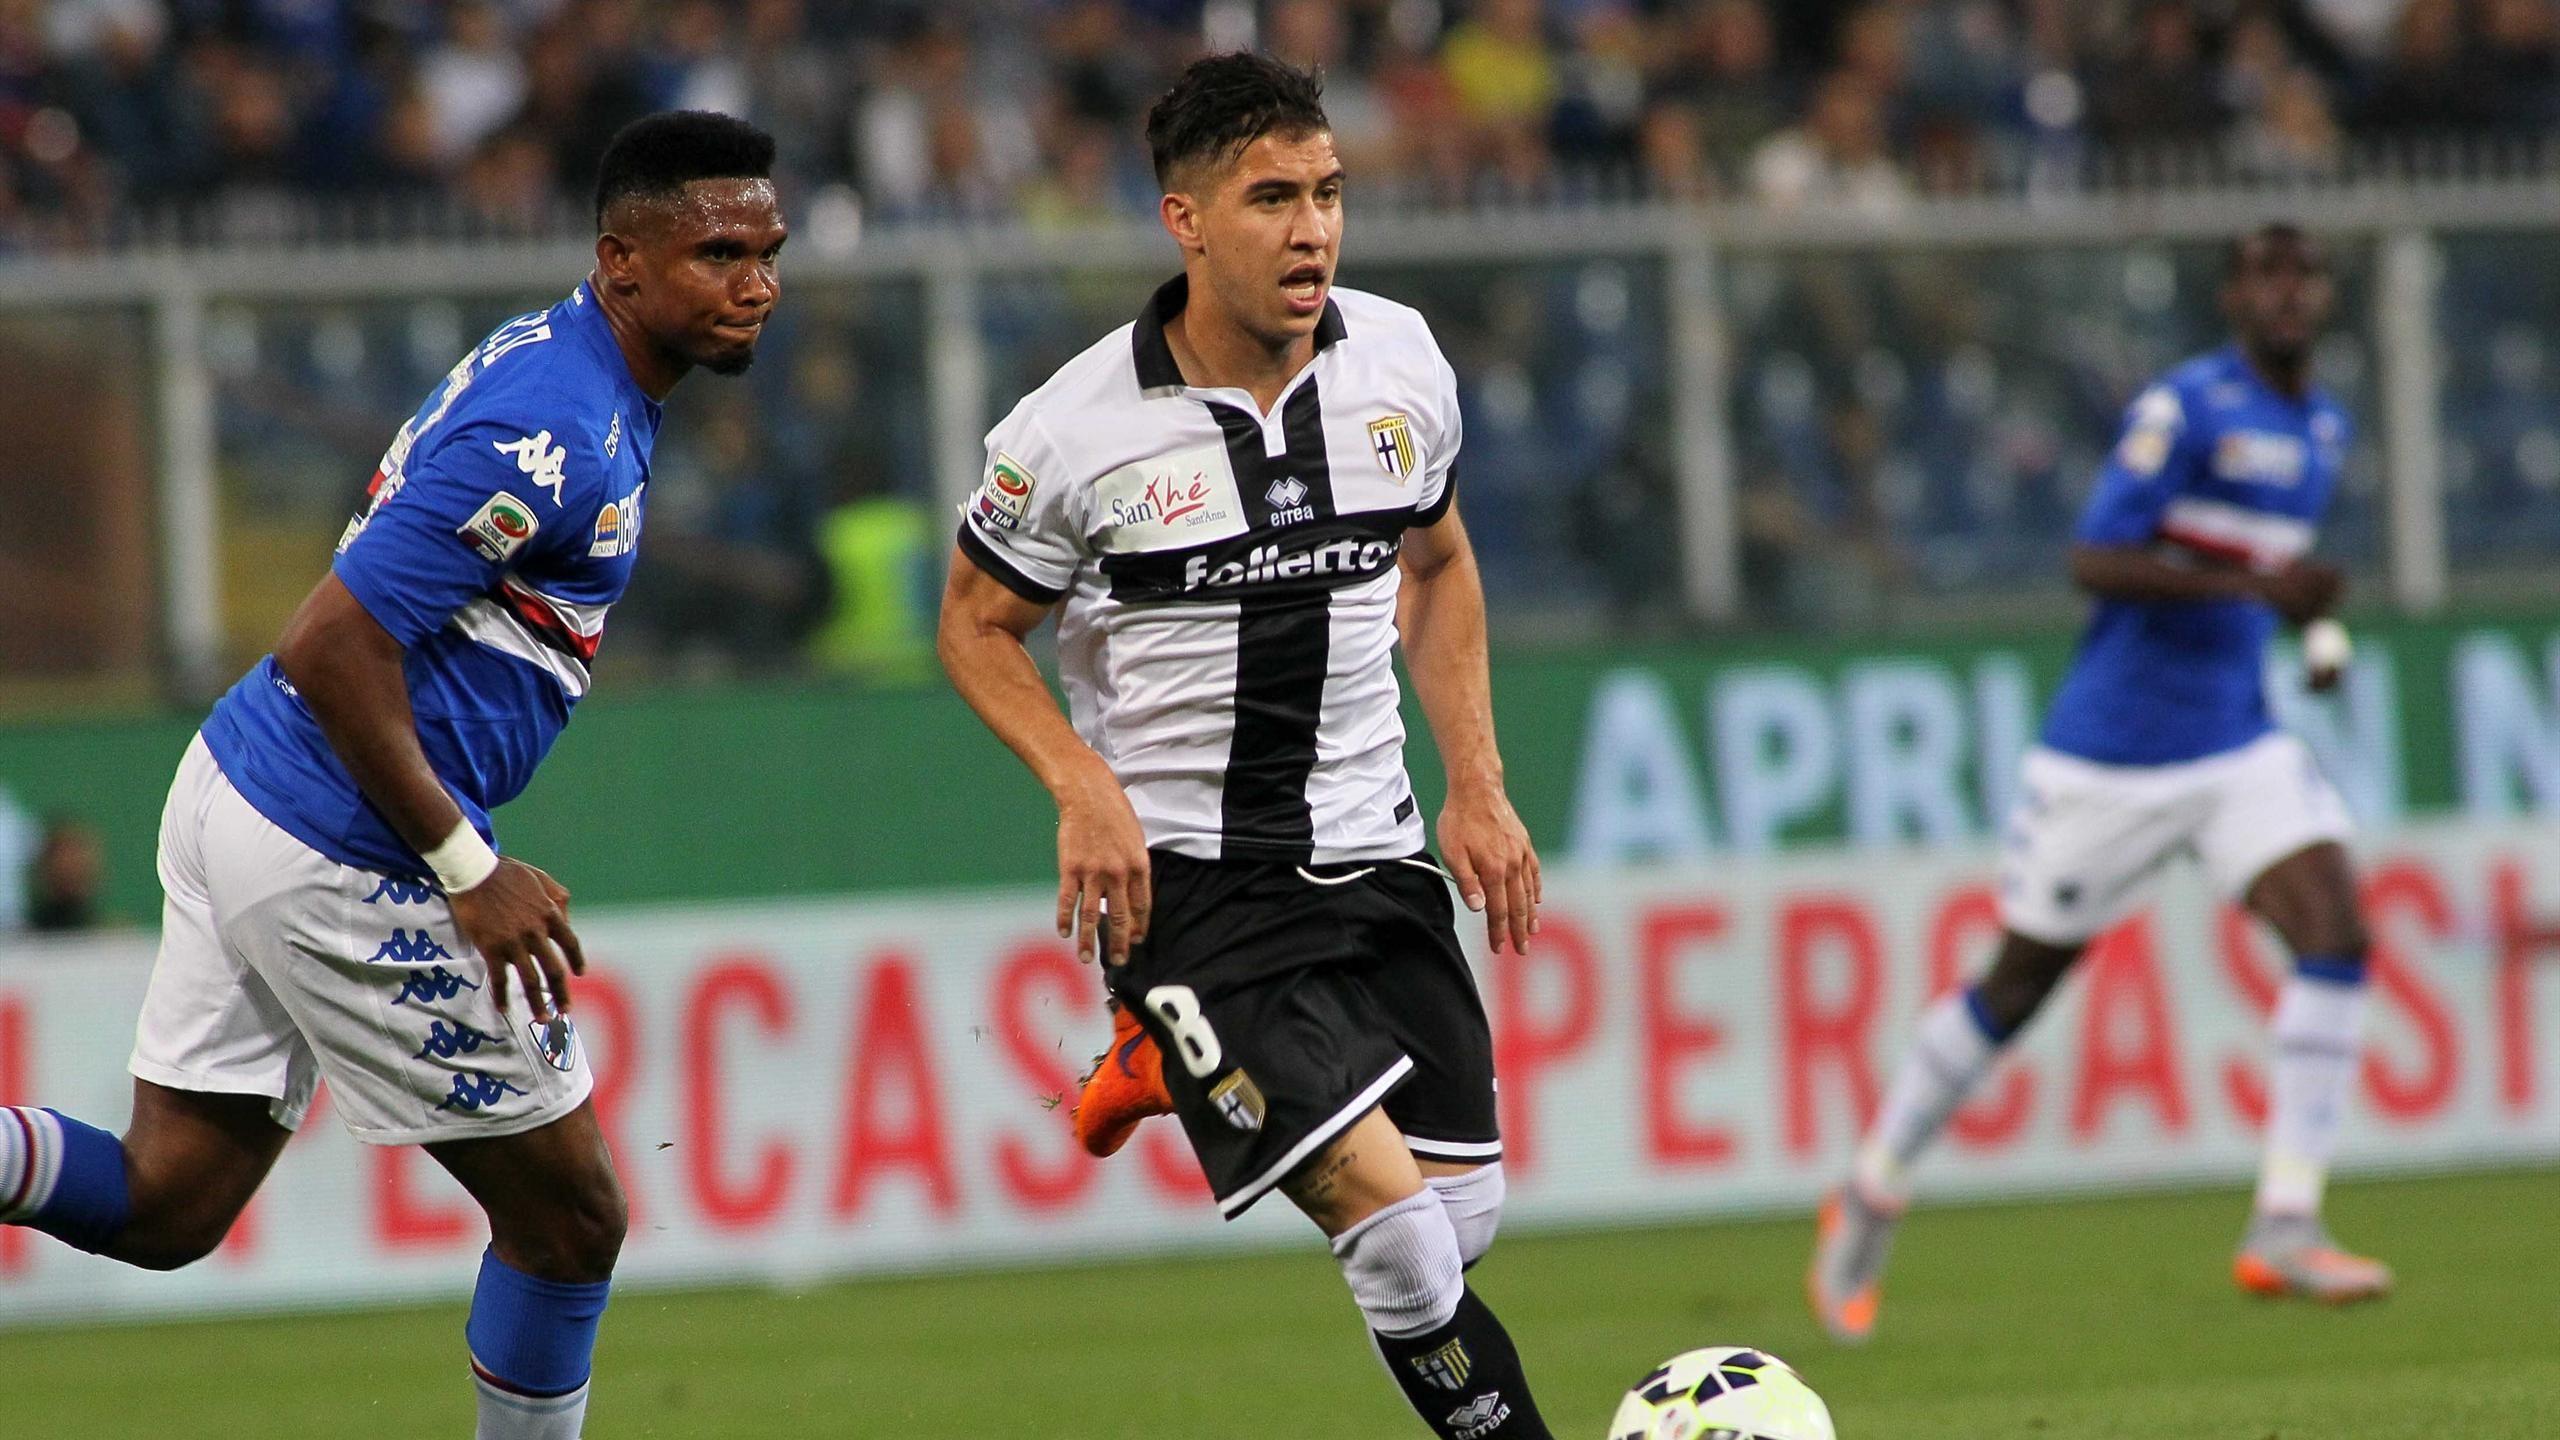 Video: Sampdoria vs Parma